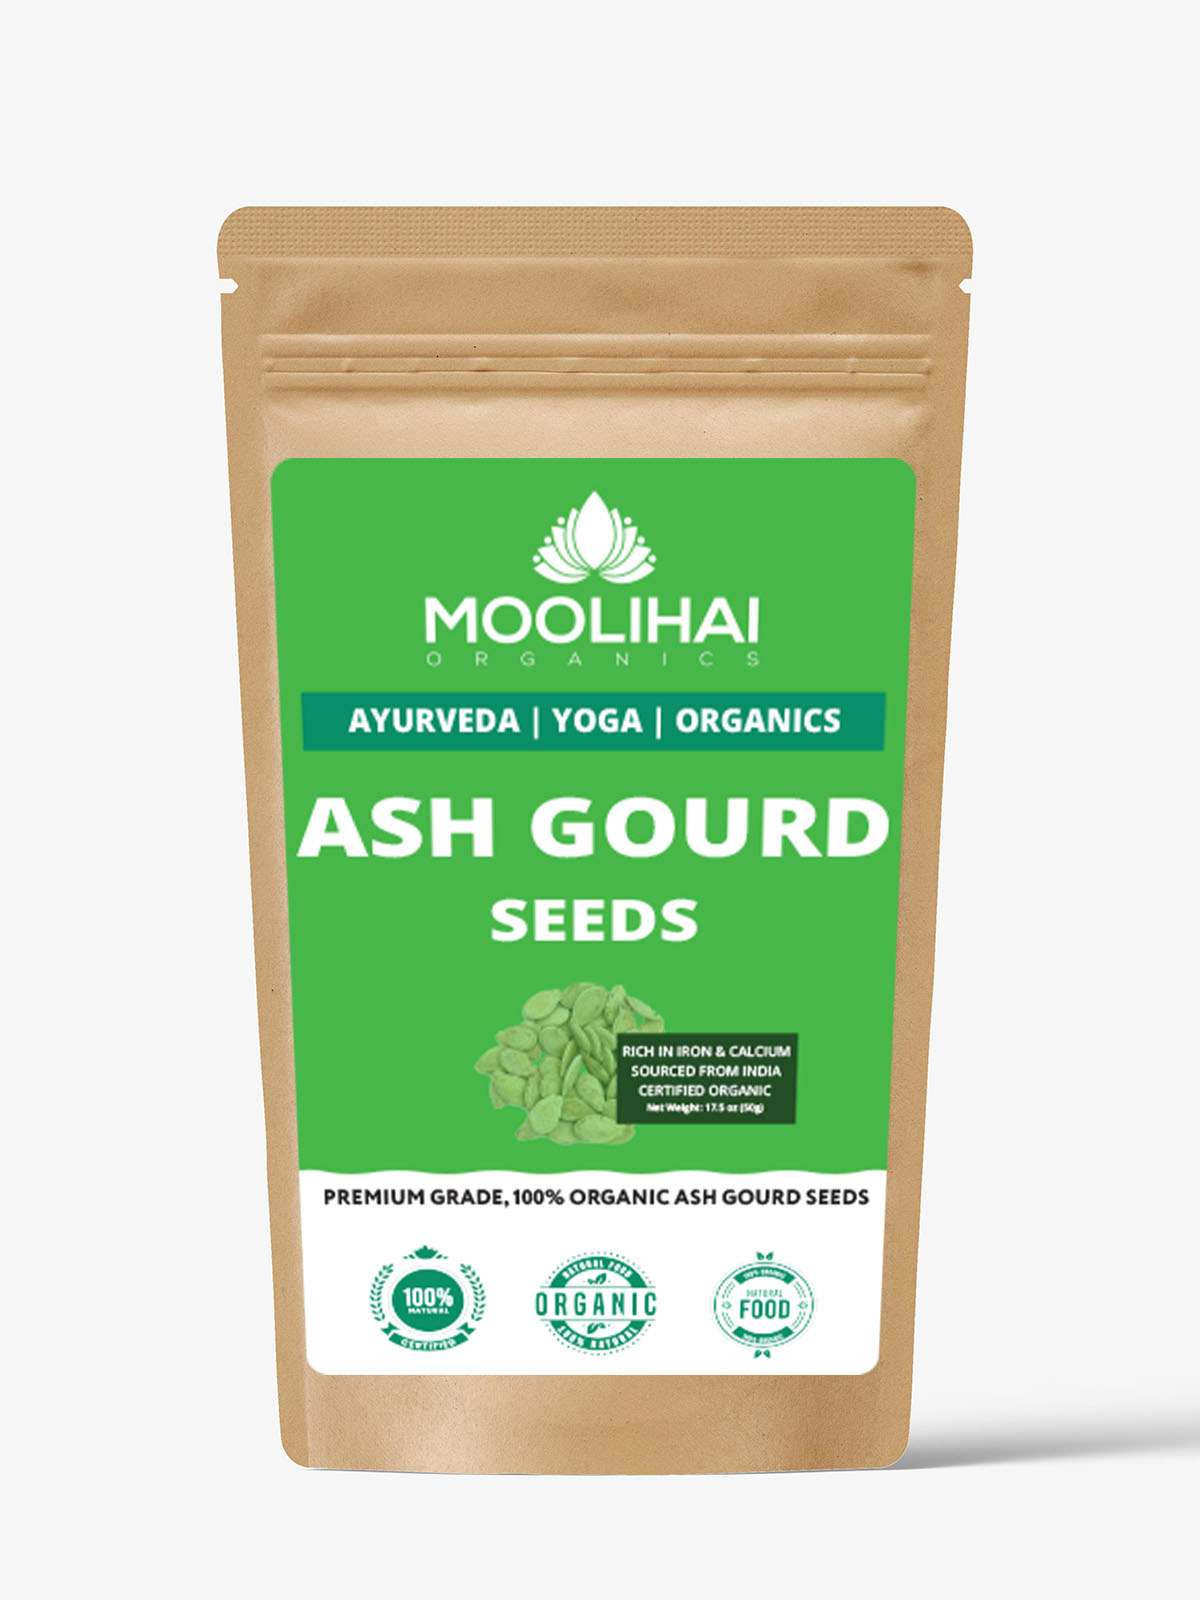 Ash gourd seeds